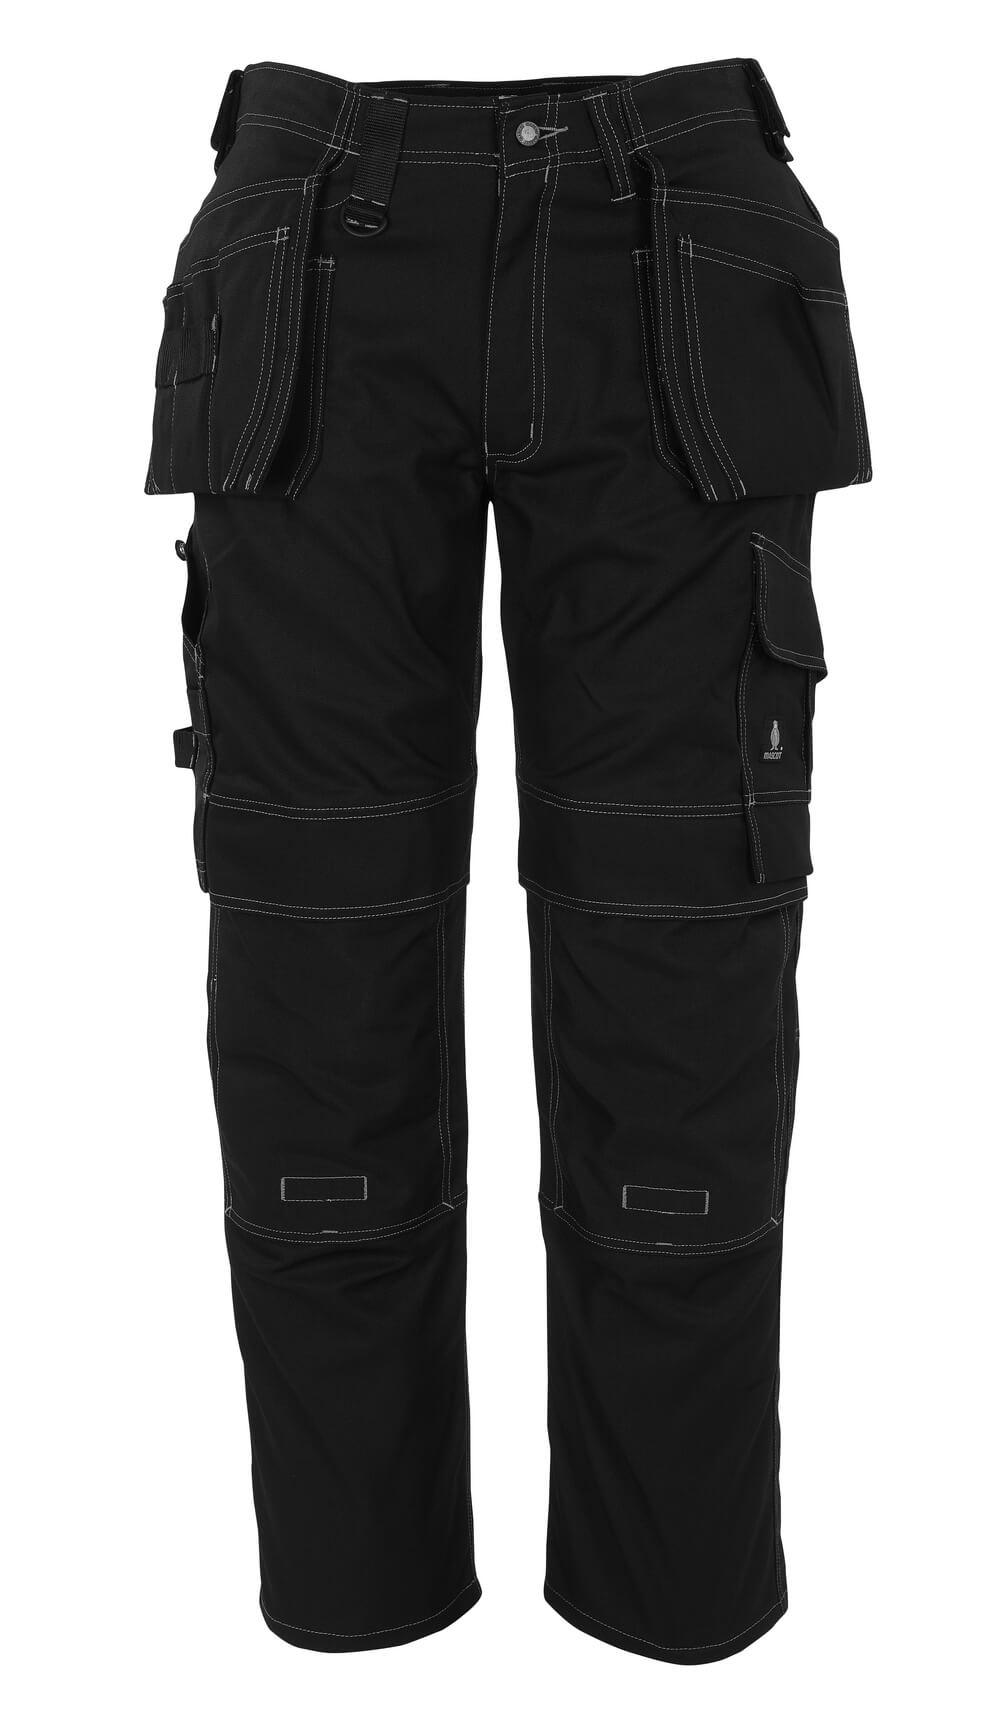 08131-010-09 Pantalones con bolsillos tipo funda - negro